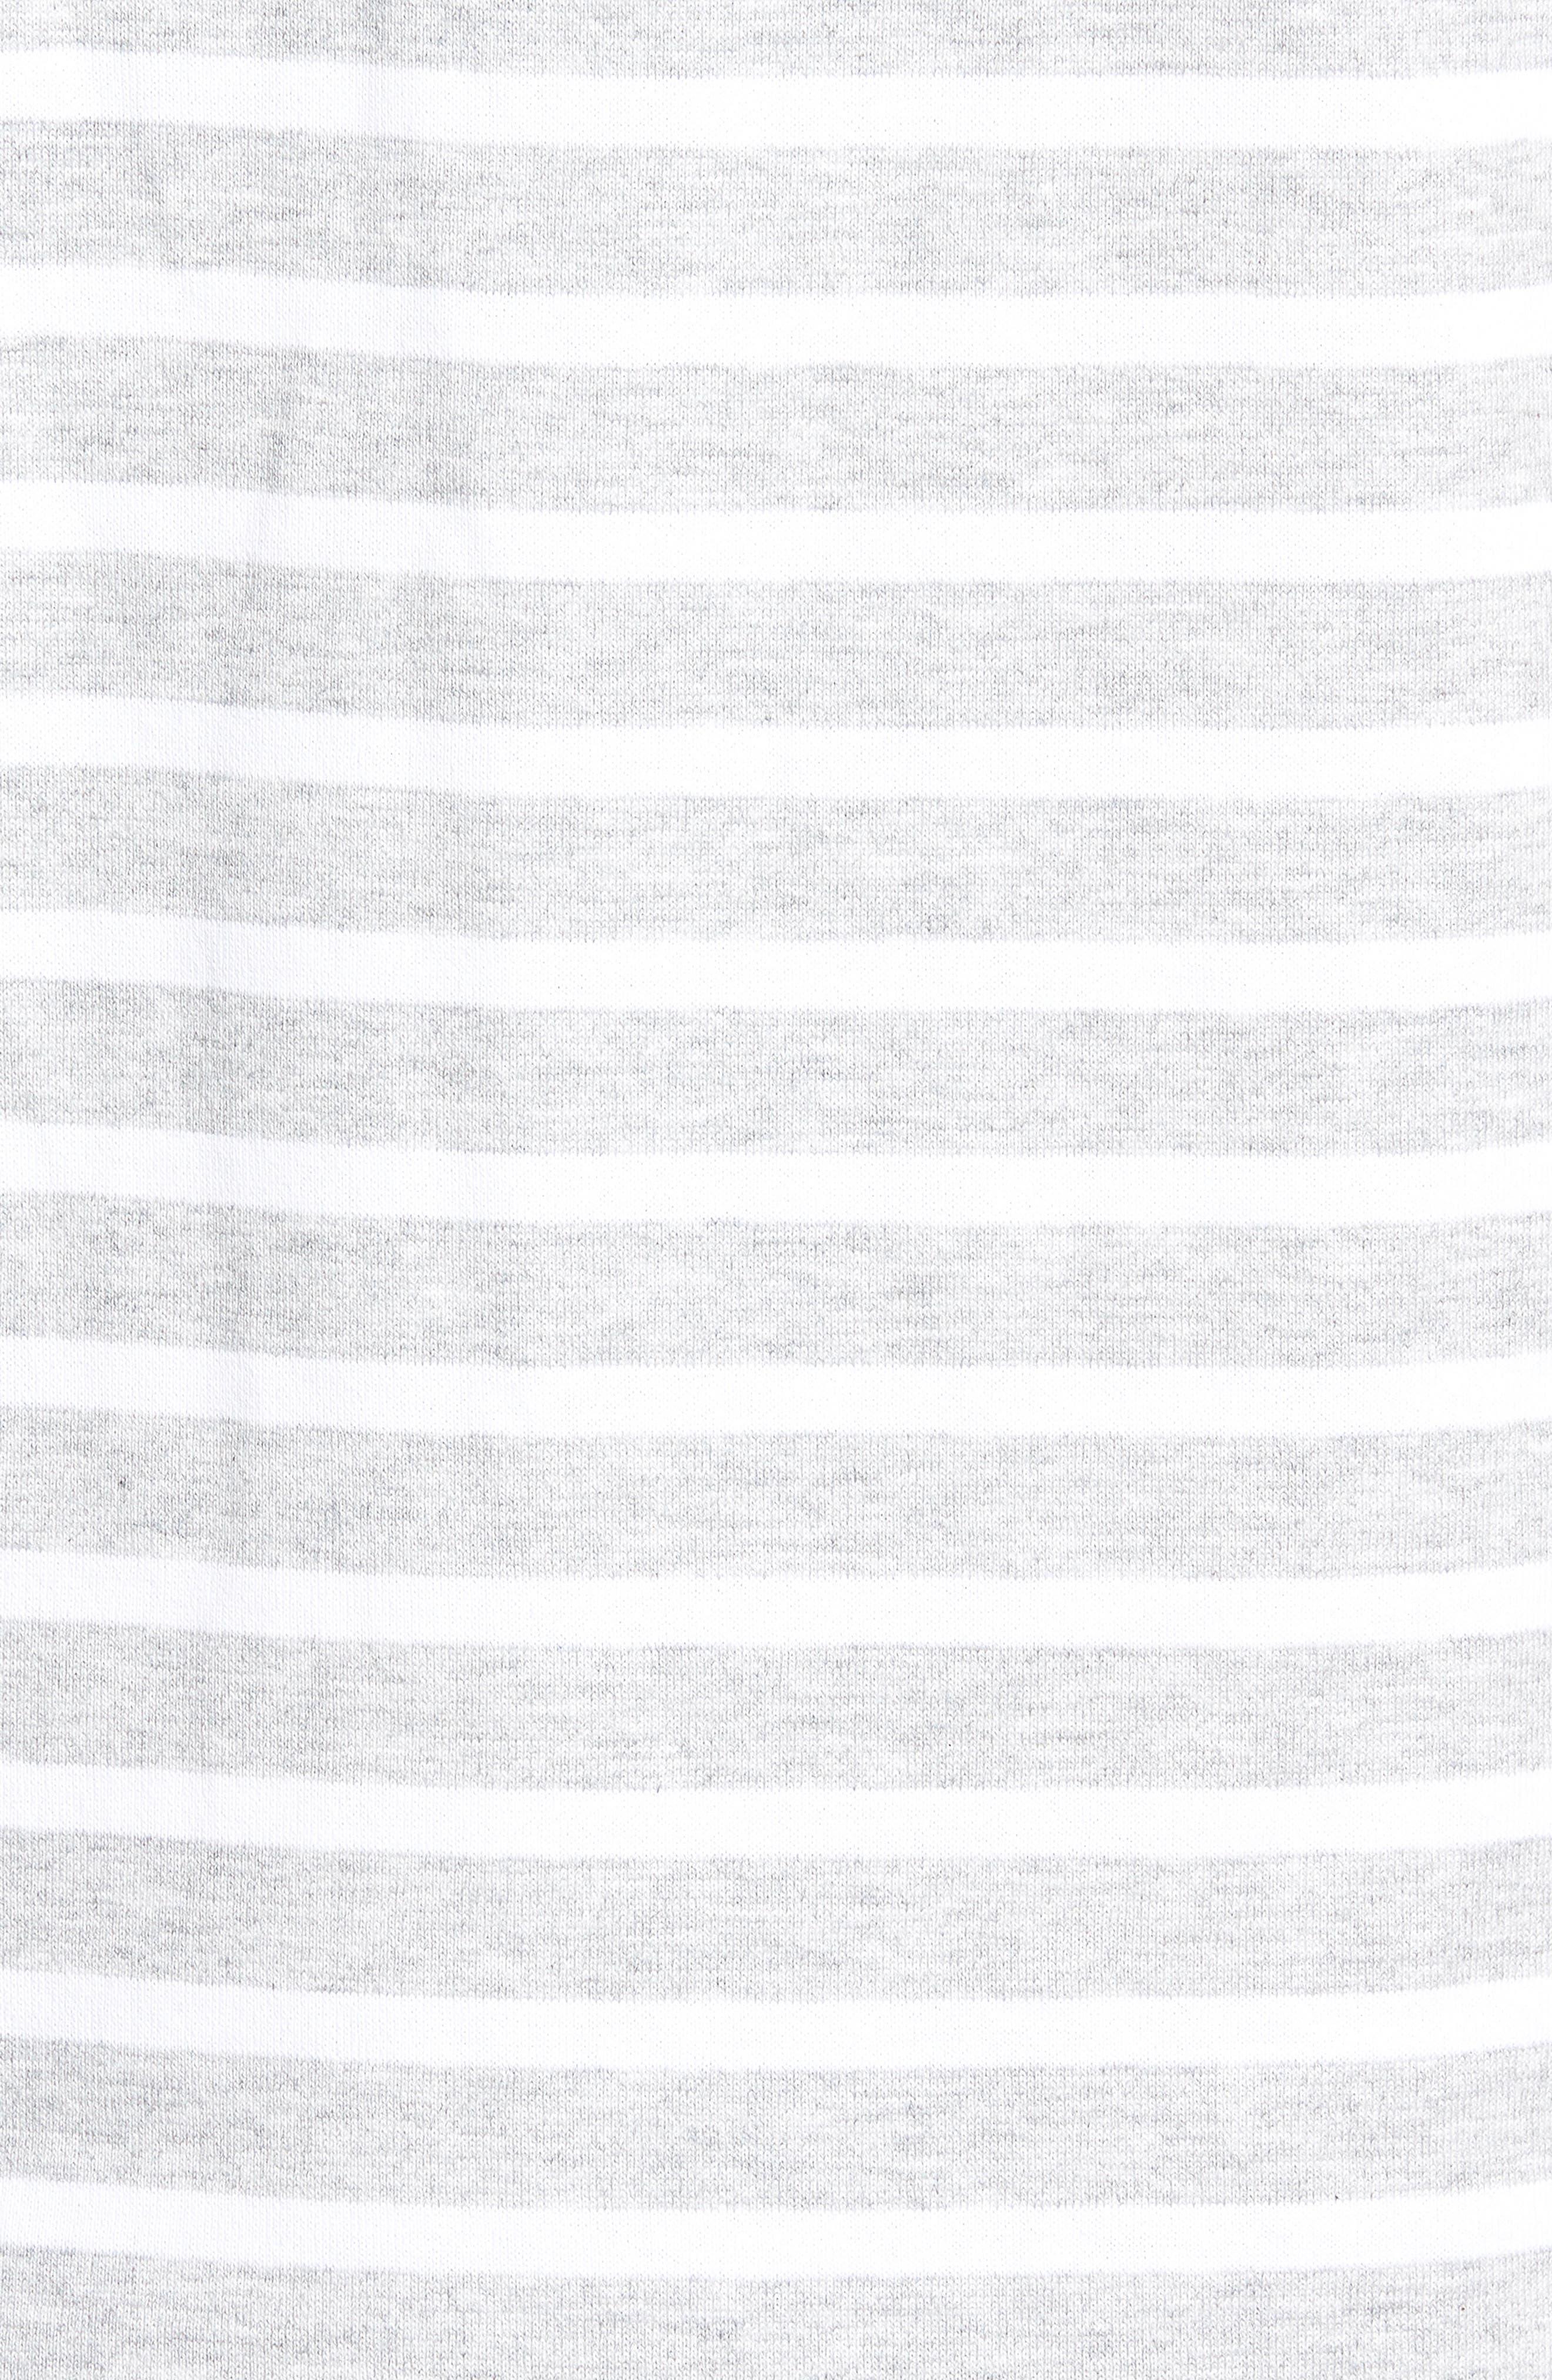 Tessler Slim Fit Crewneck T-Shirt,                             Alternate thumbnail 5, color,                             072